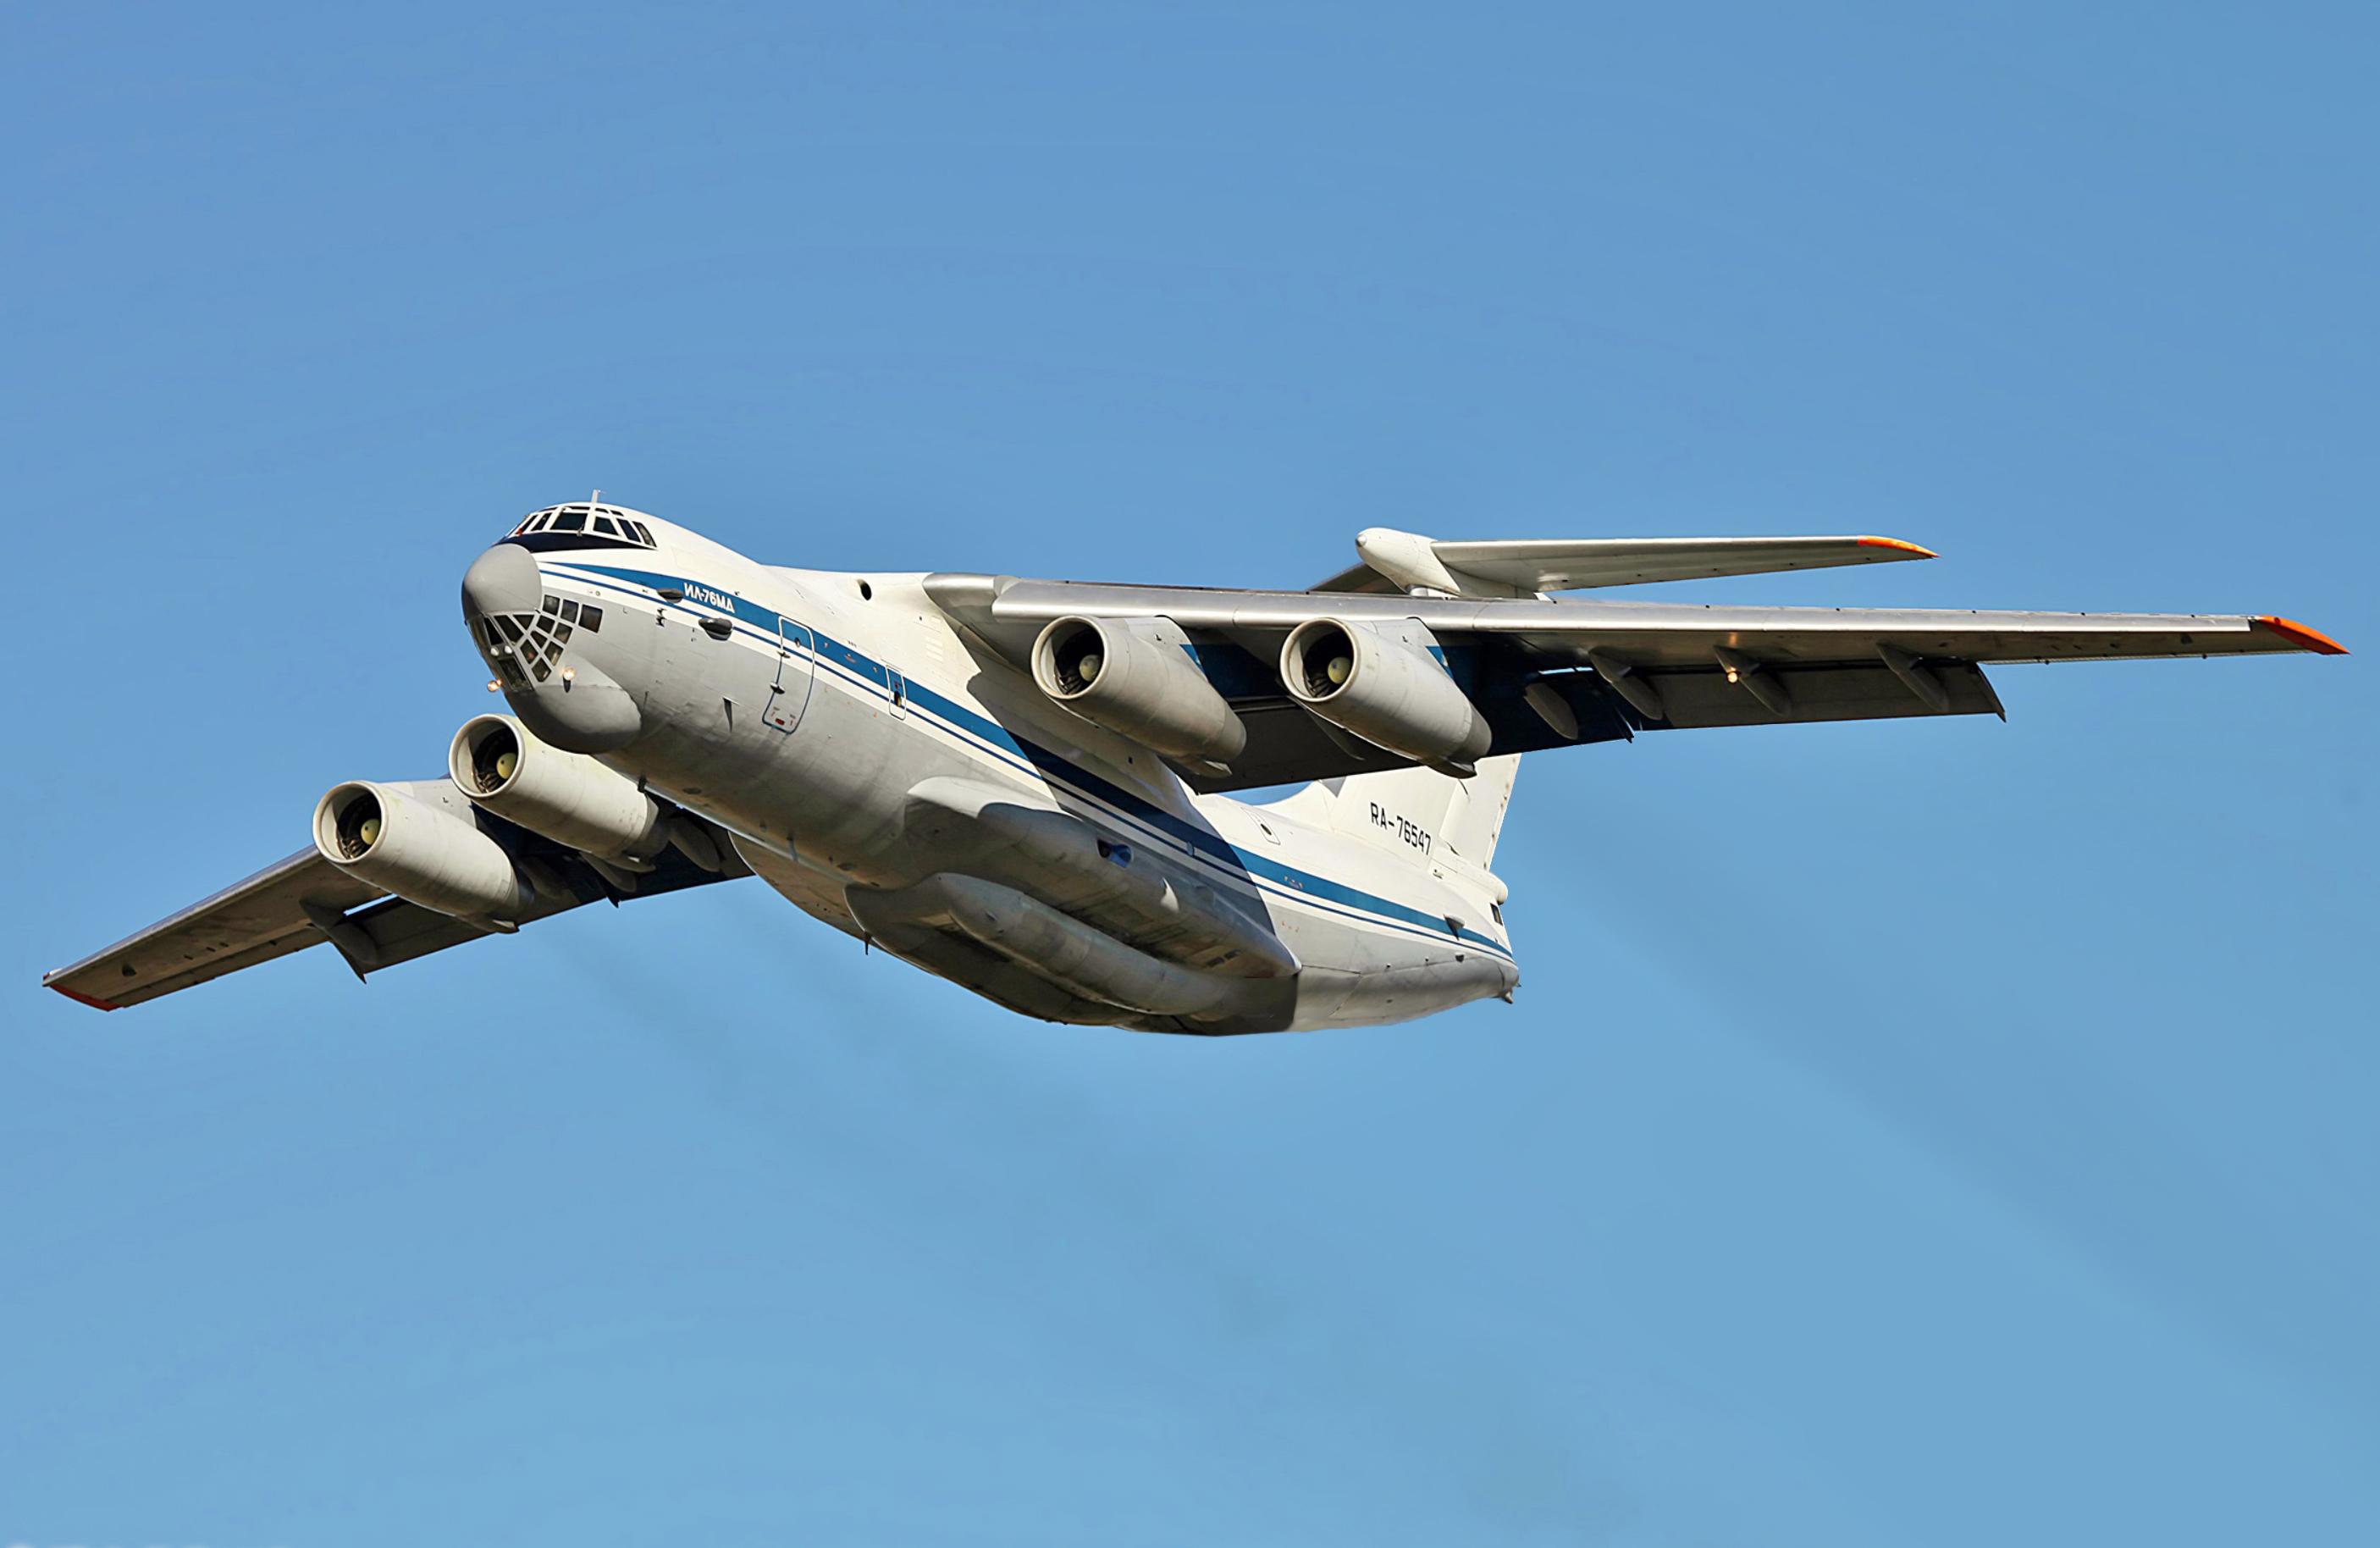 IL-76MD_-_TankBiathlon2013_%28modified%29.jpg